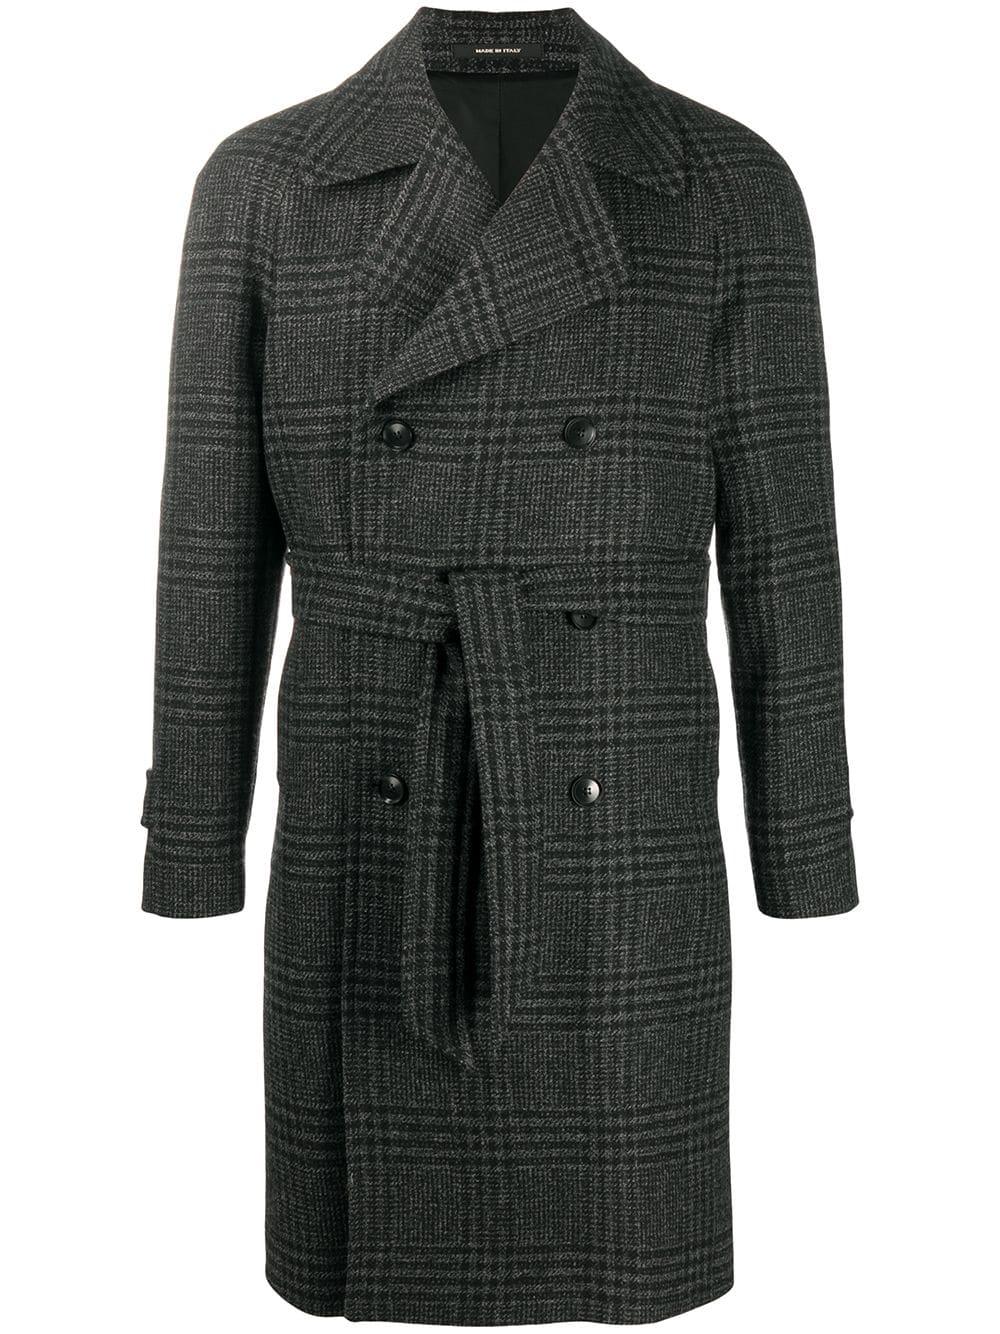 Power Outerwear...Cool Coats for Cool Days, men's plaid coats, men's plaid jackets, Tagliatore men's plaid check wool trench coat